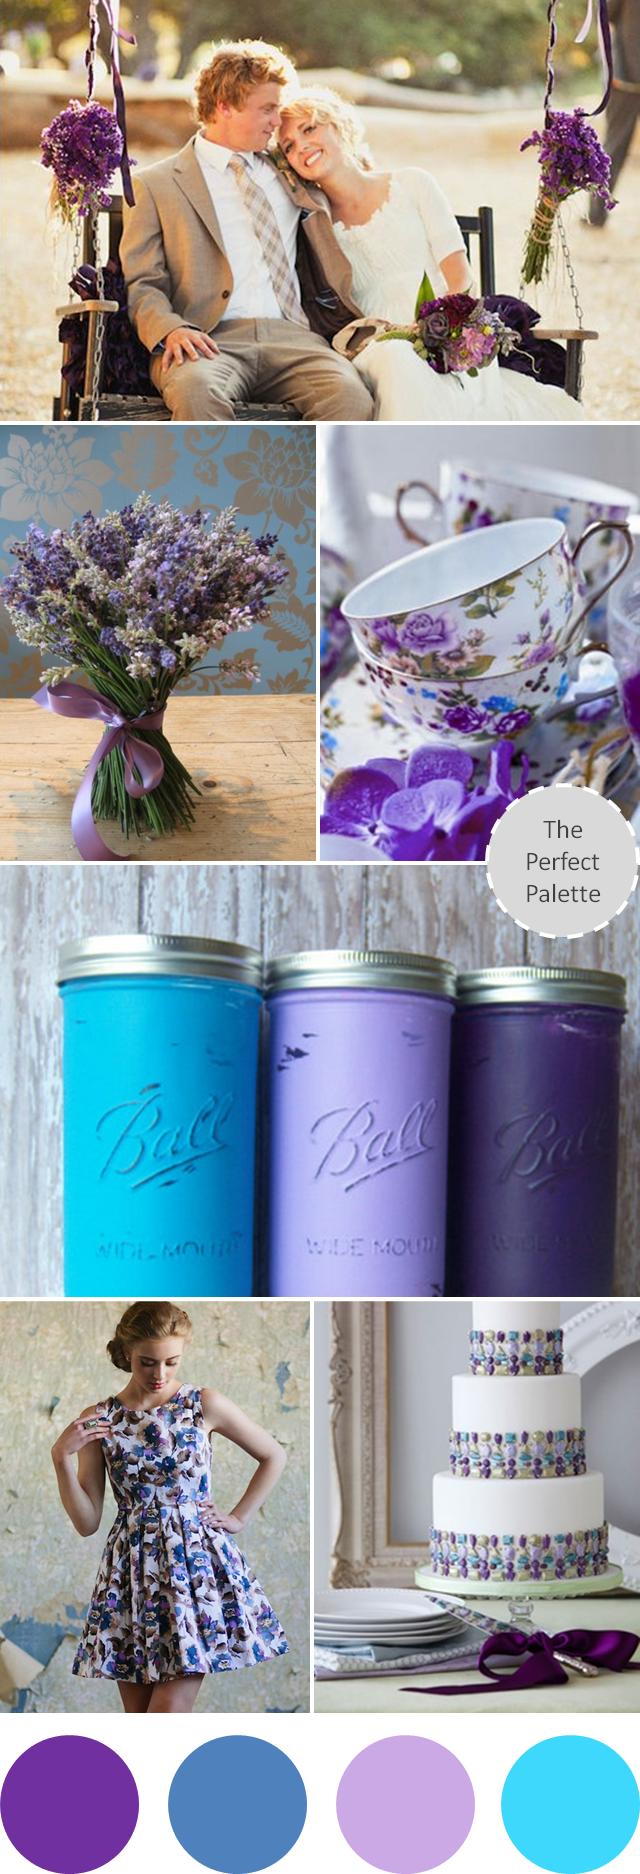 Purple and blue wedding decor  Wedding Colors I Love  Someday uc  Pinterest  Weddings Wedding